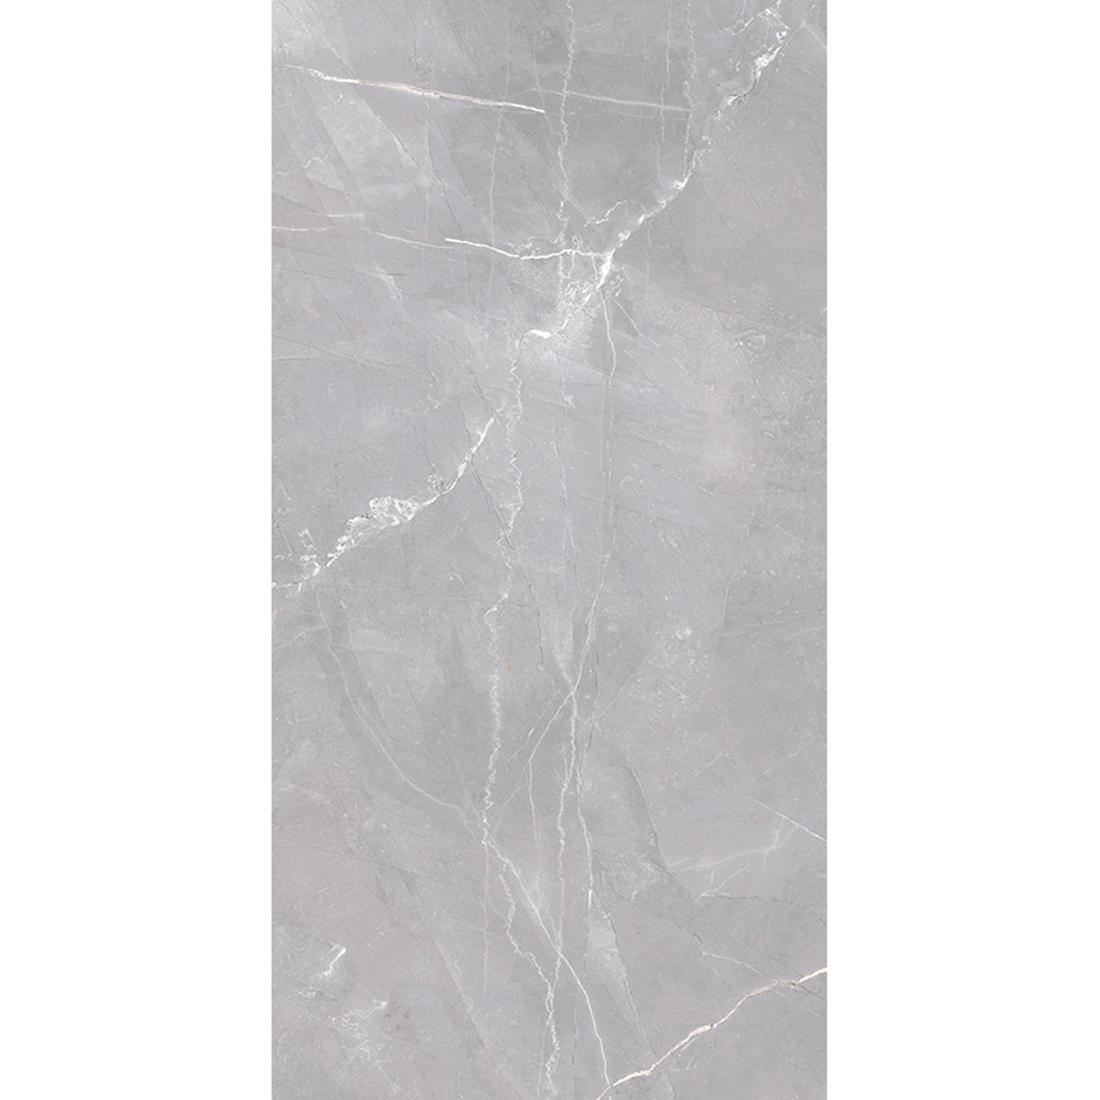 Nitco Aeon Amani N5003-IG Glossy Glazed Vitrified Tile